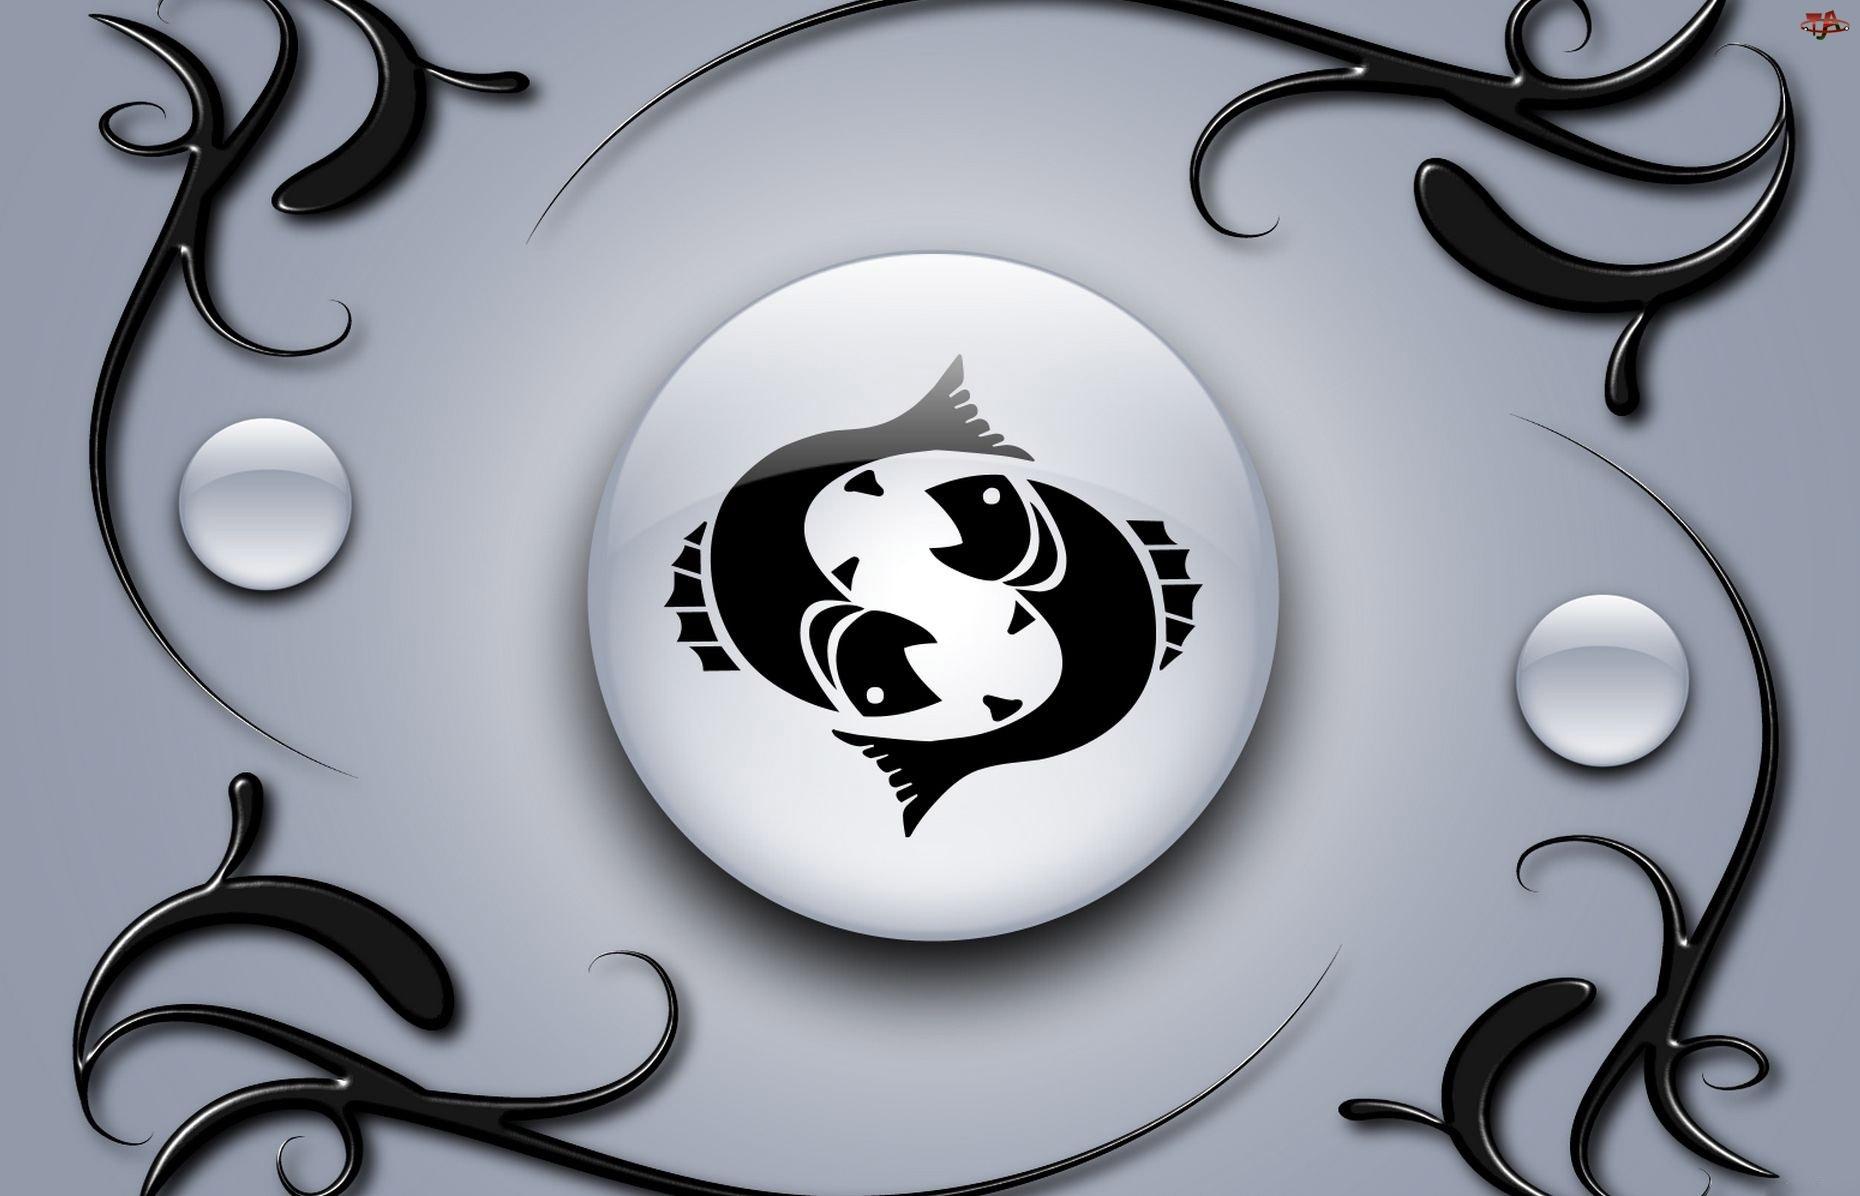 Znak Zodiaku Ryby Ryby Znak Zodiaku